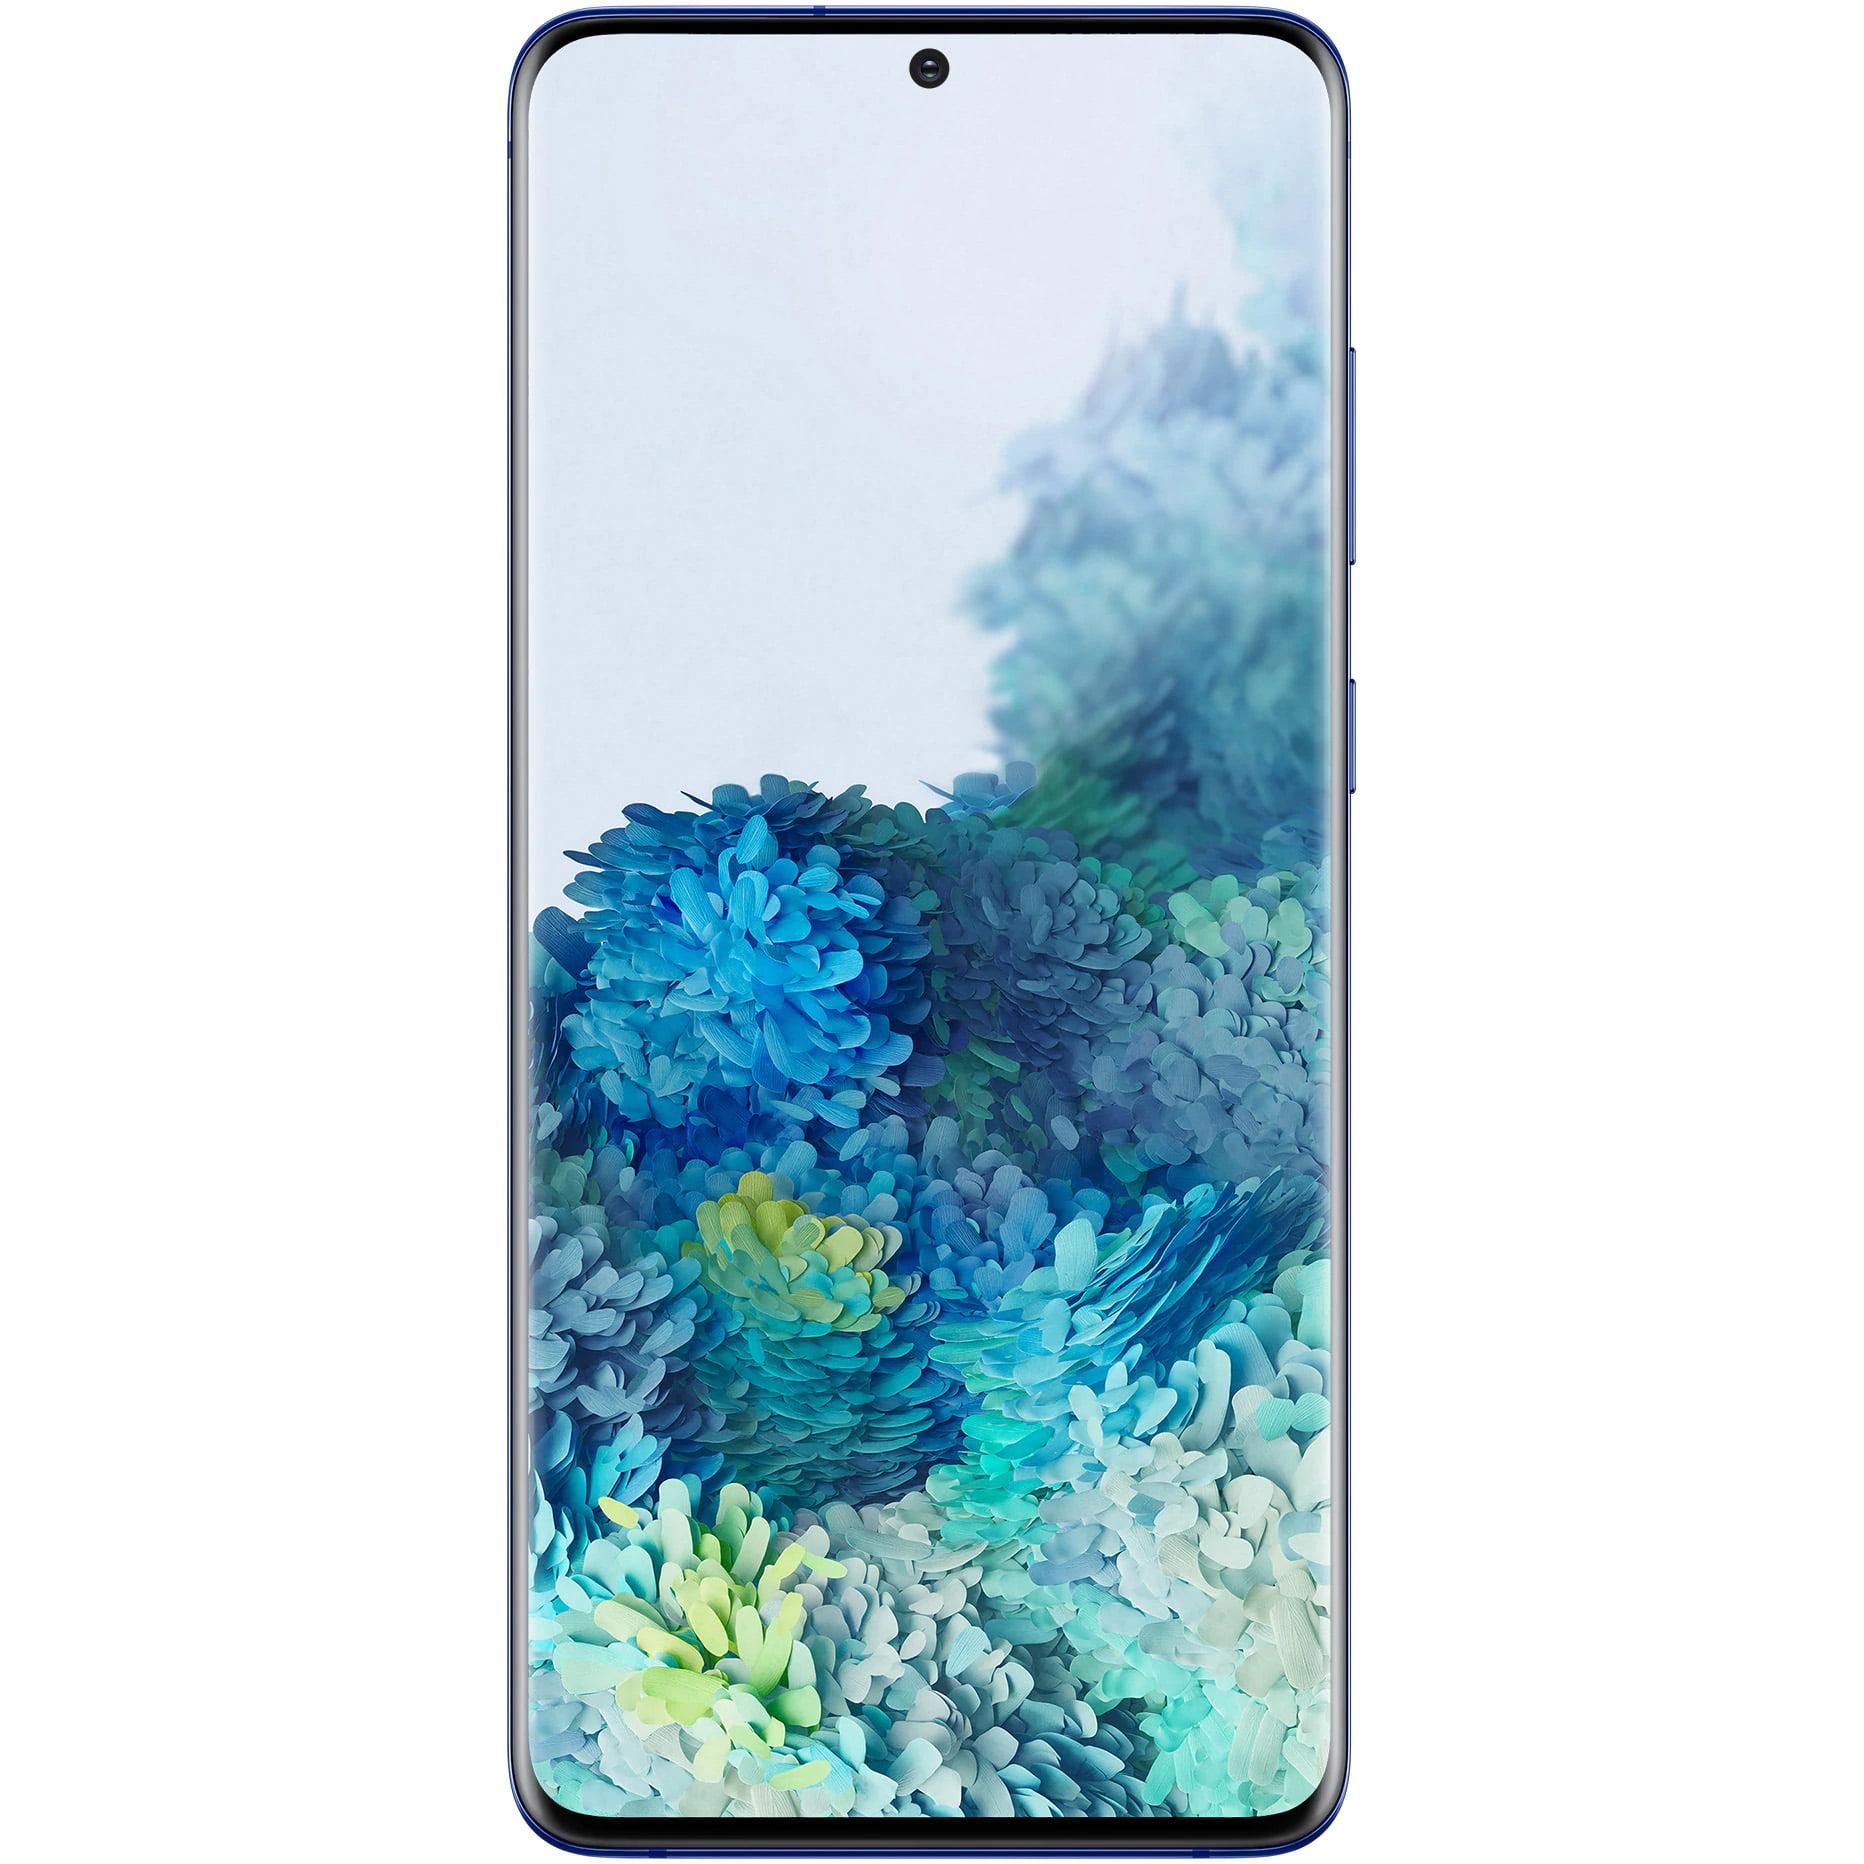 Telefon mobil Samsung Galaxy S20 Plus, Dual SIM, 128GB, 12GB RAM, 5G, Aurora Blue